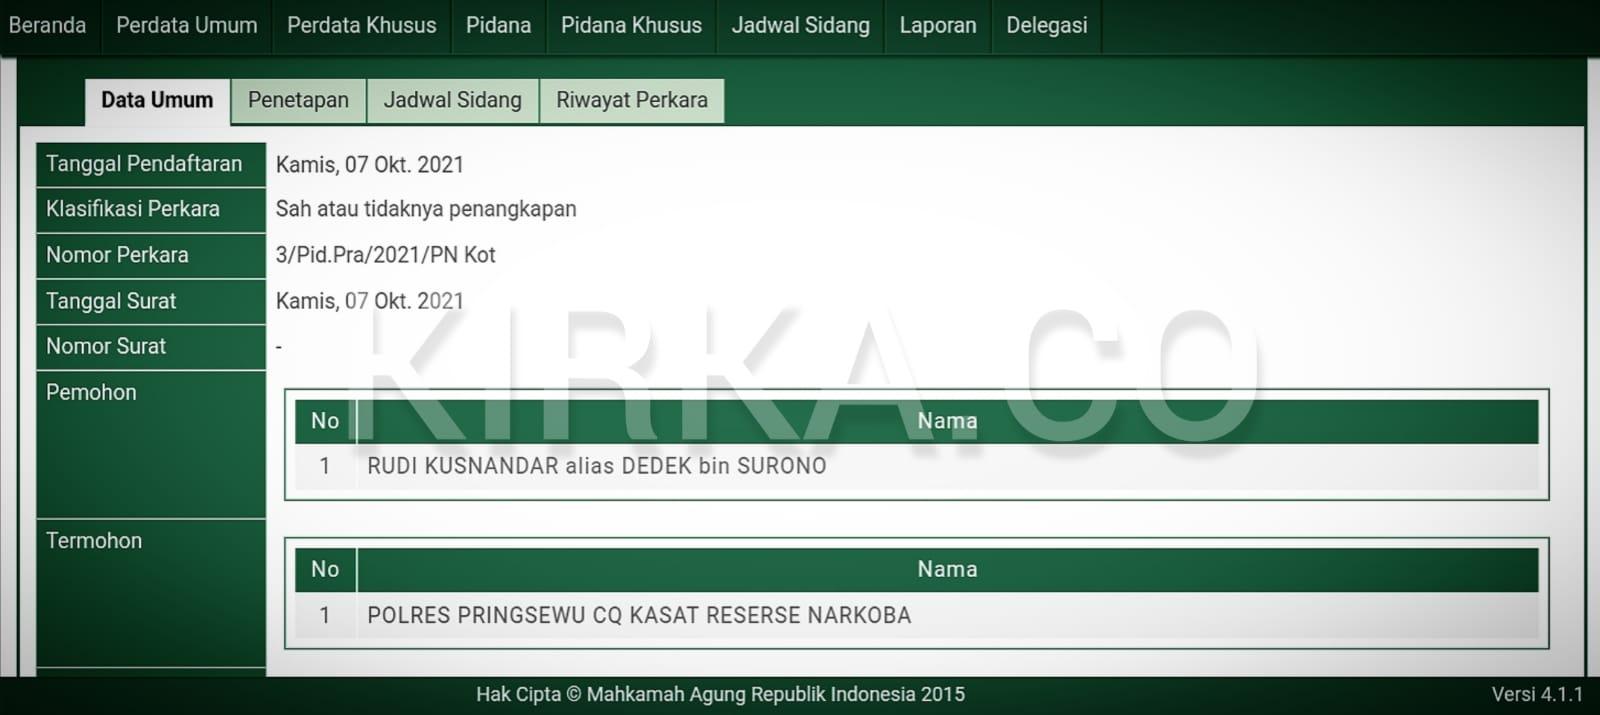 Rudi Kusnandar Praperadilankan Kasat Reserse Narkotika Polres Pringsewu